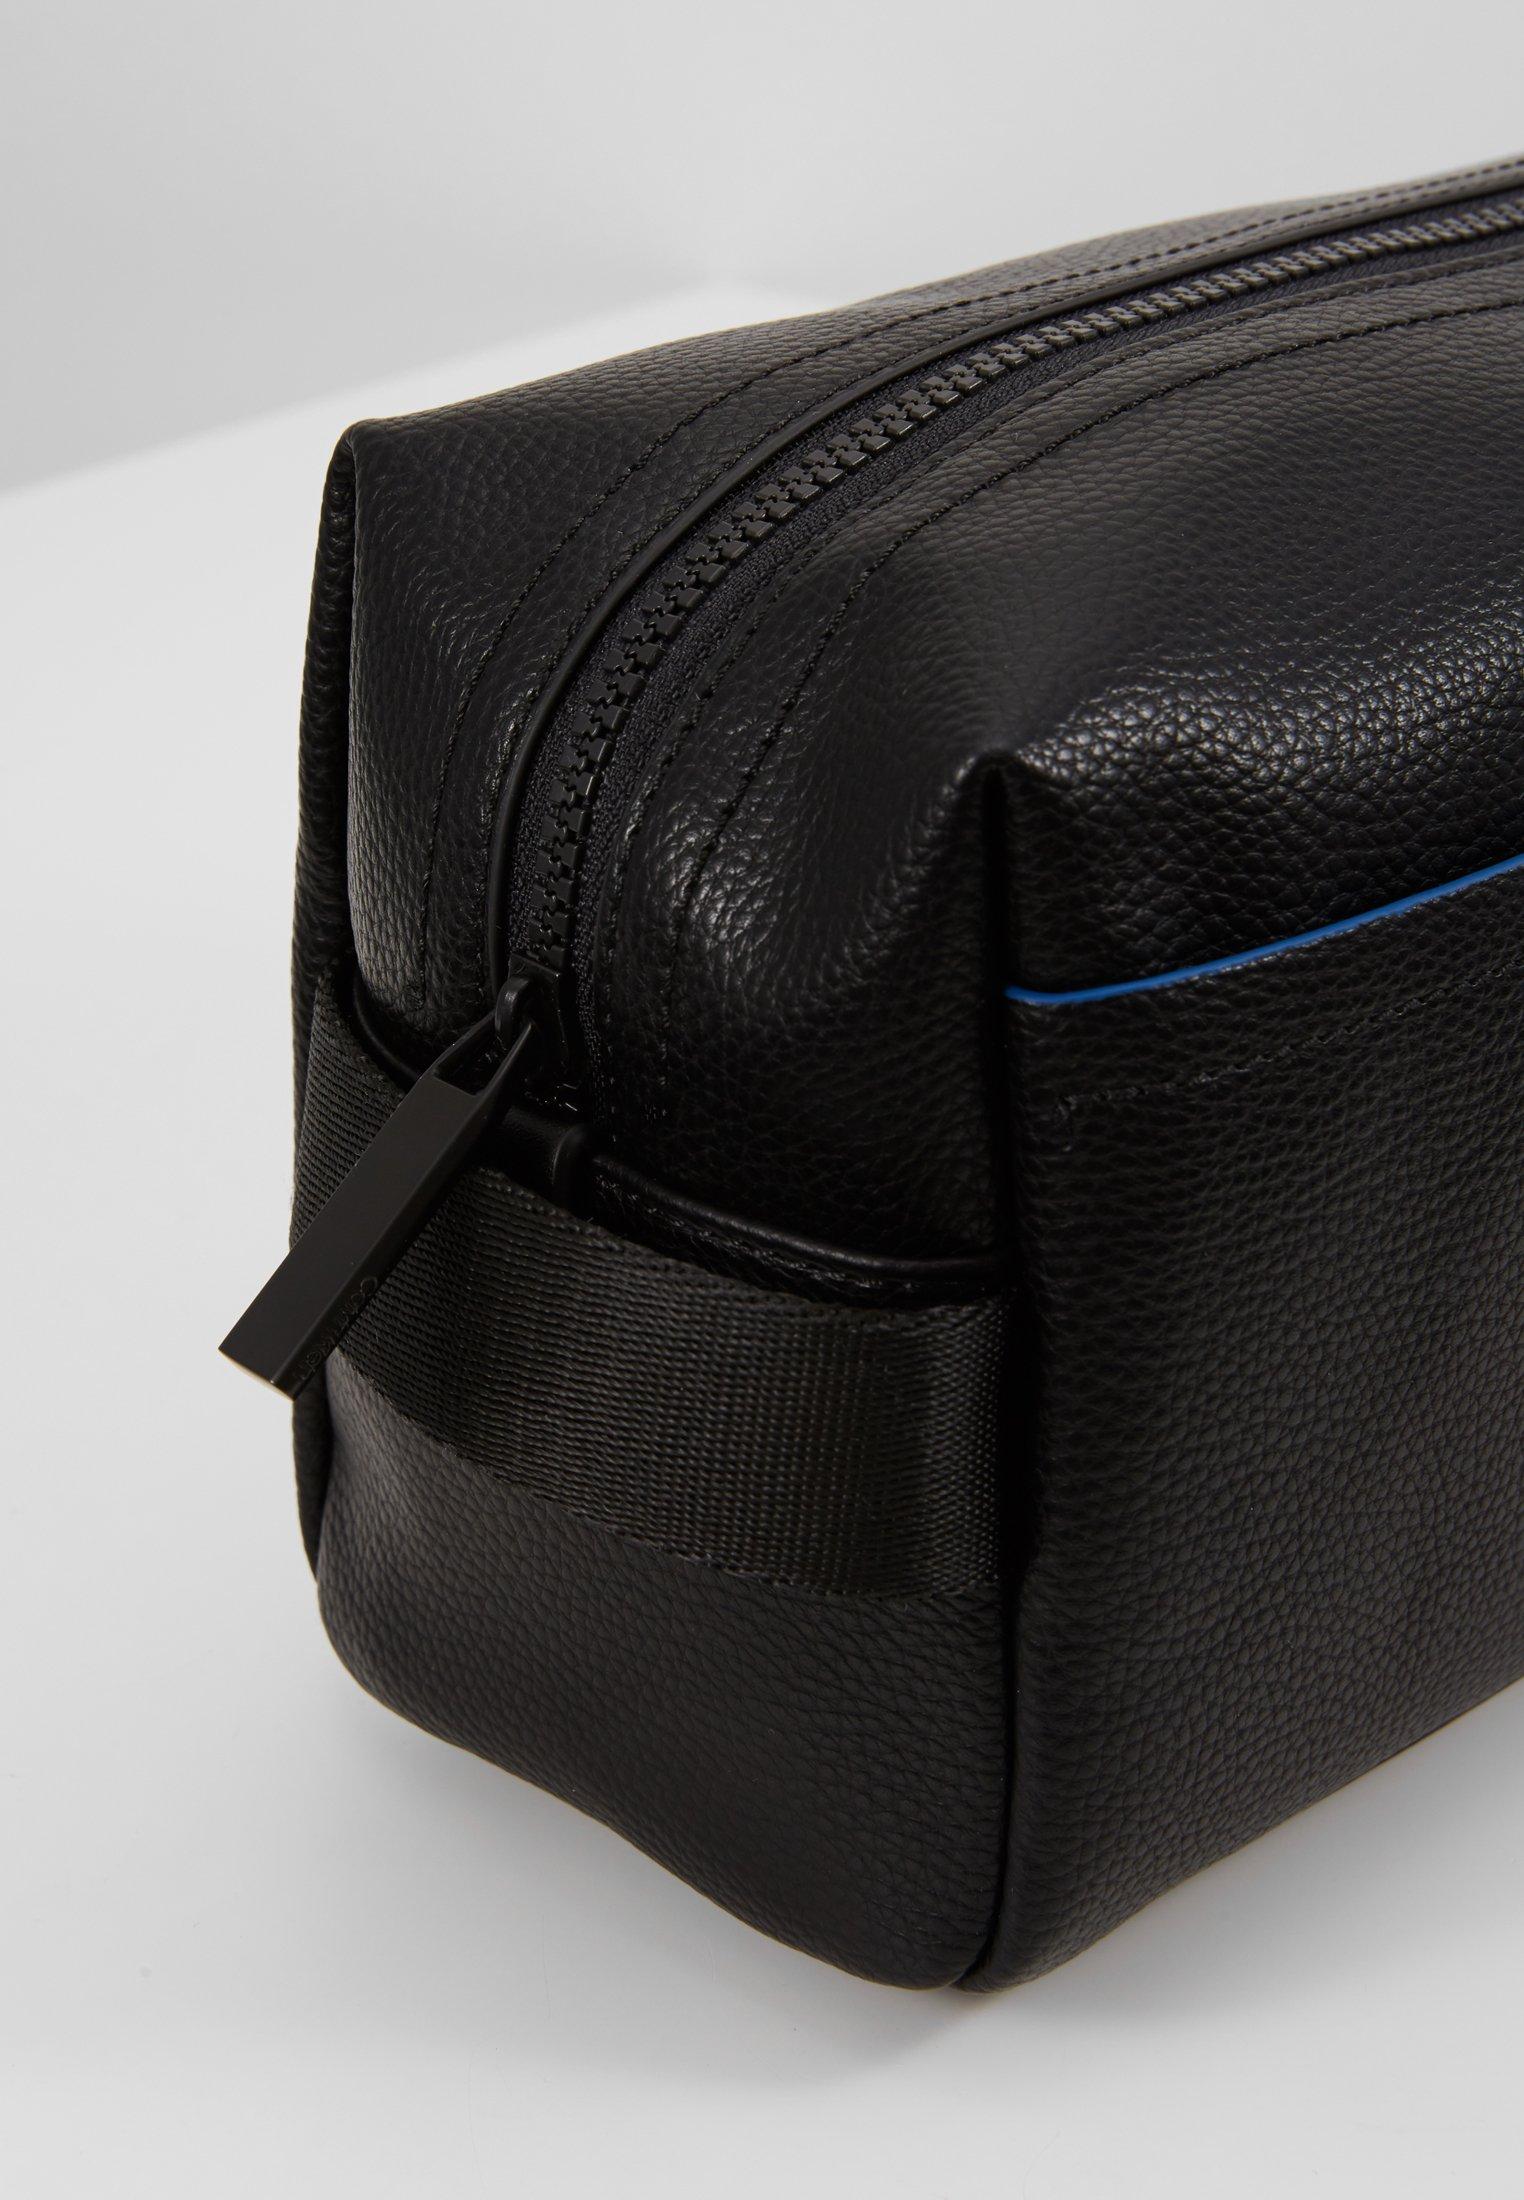 WashbagTrousse Black Calvin Klein Klein Direct Direct Calvin vnmPNOy80w